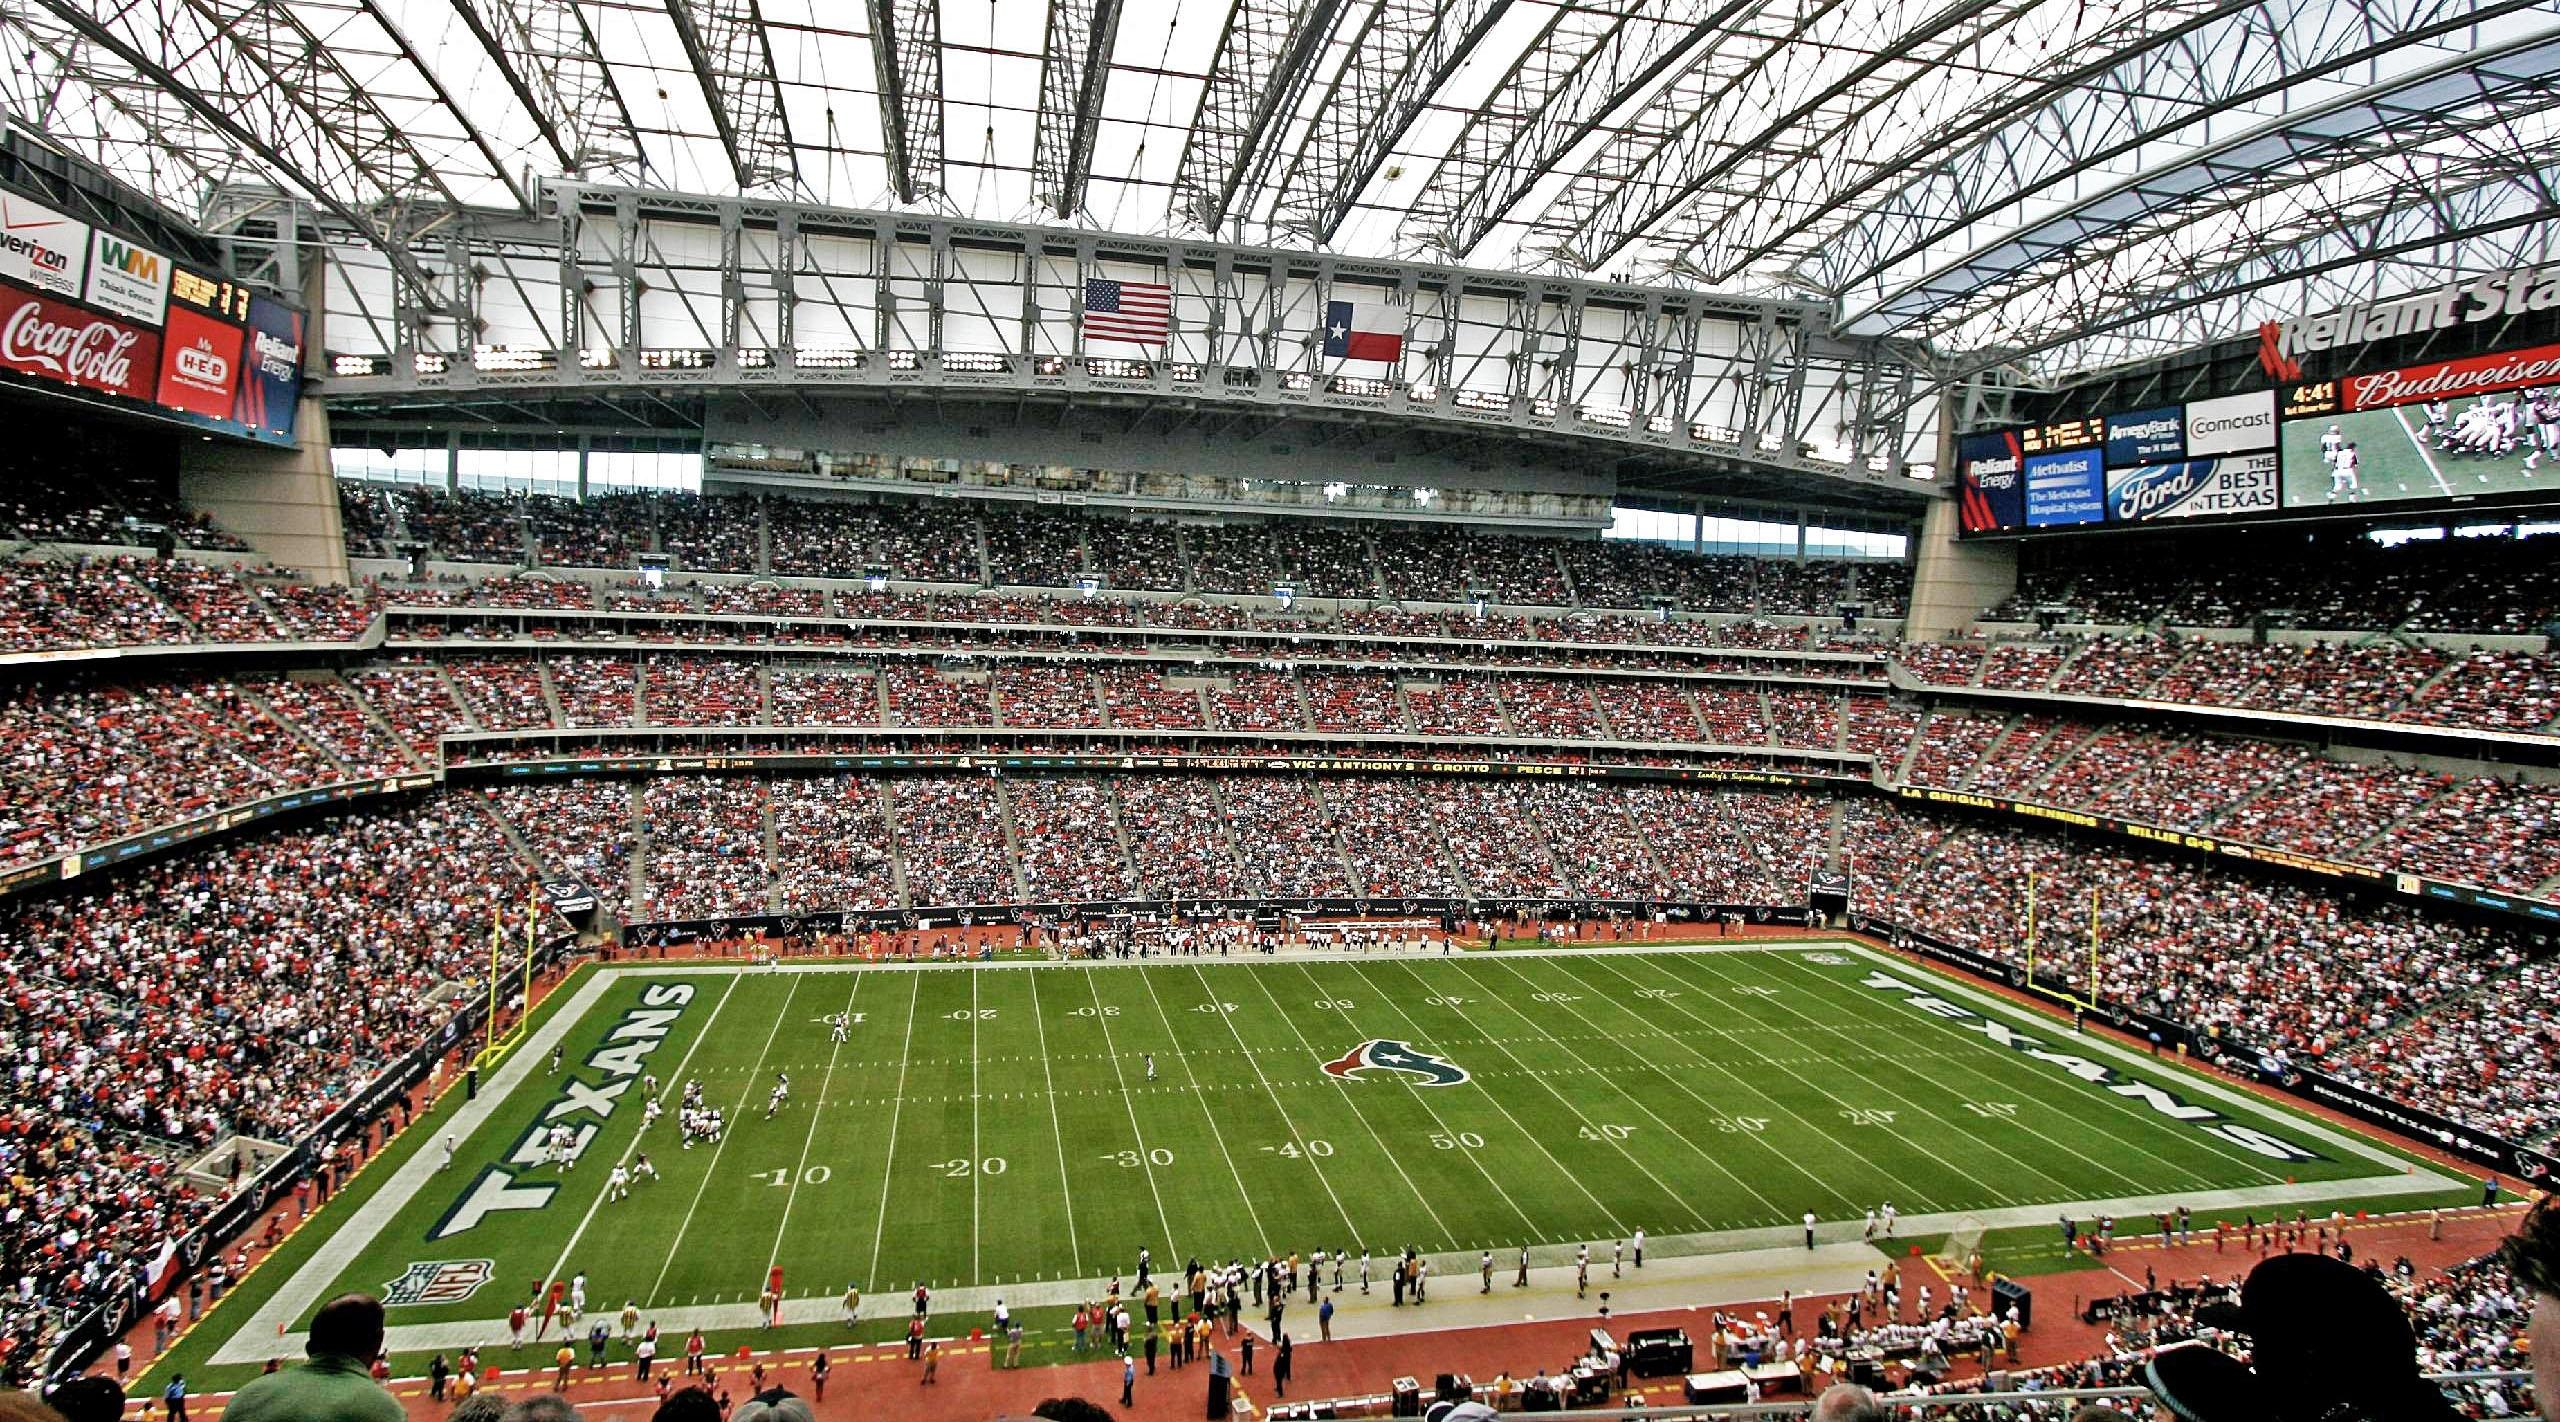 Nrg Stadium - Wikipedia in Atlanta Stadium Super Bowl Seating Capacity